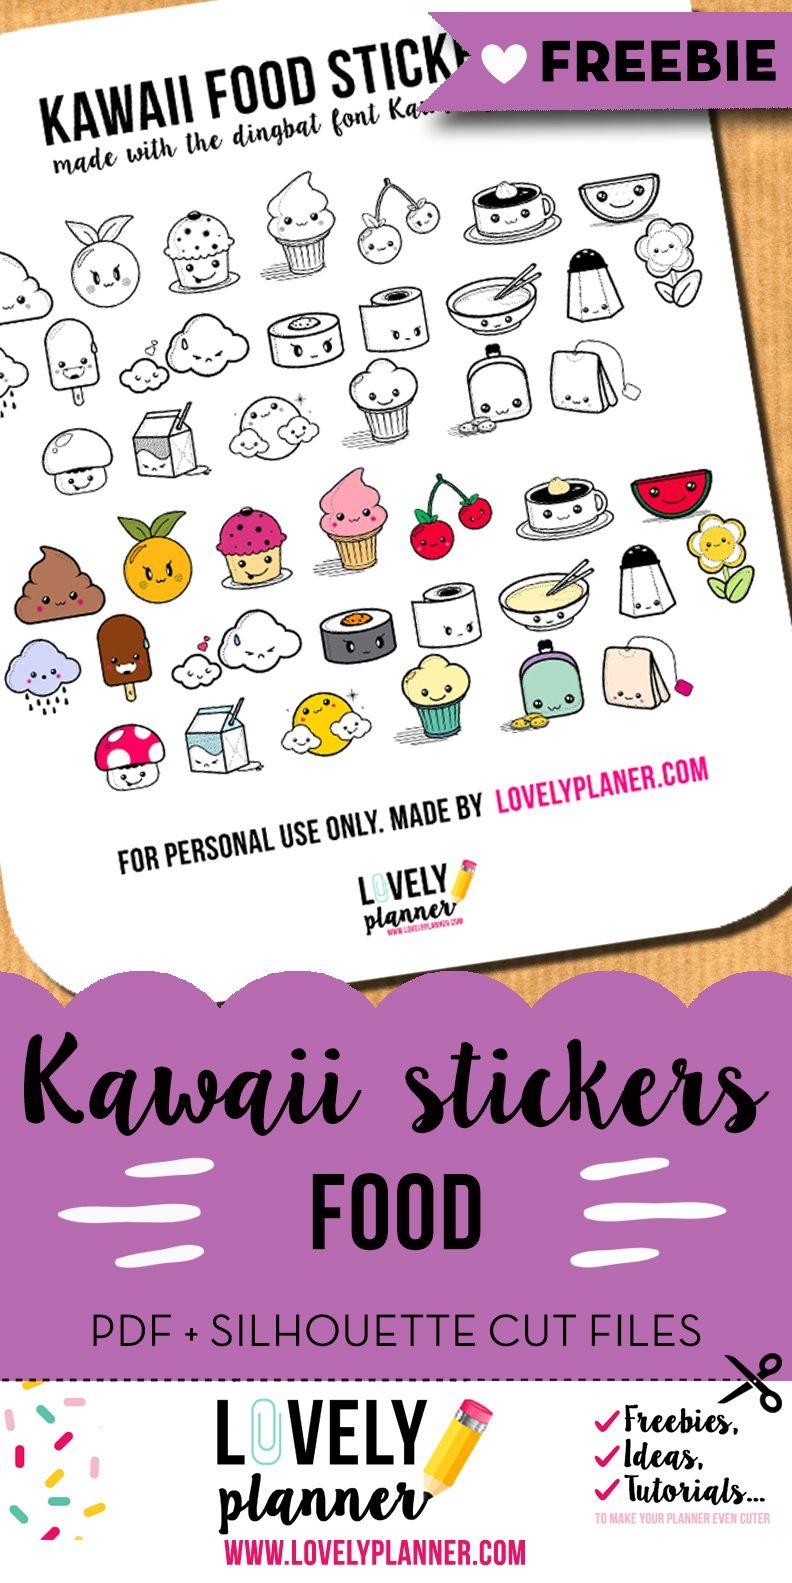 Free Printable Kawaii Food Planner Stickers From Lovelyplanner - Free Printable Kawaii Stickers